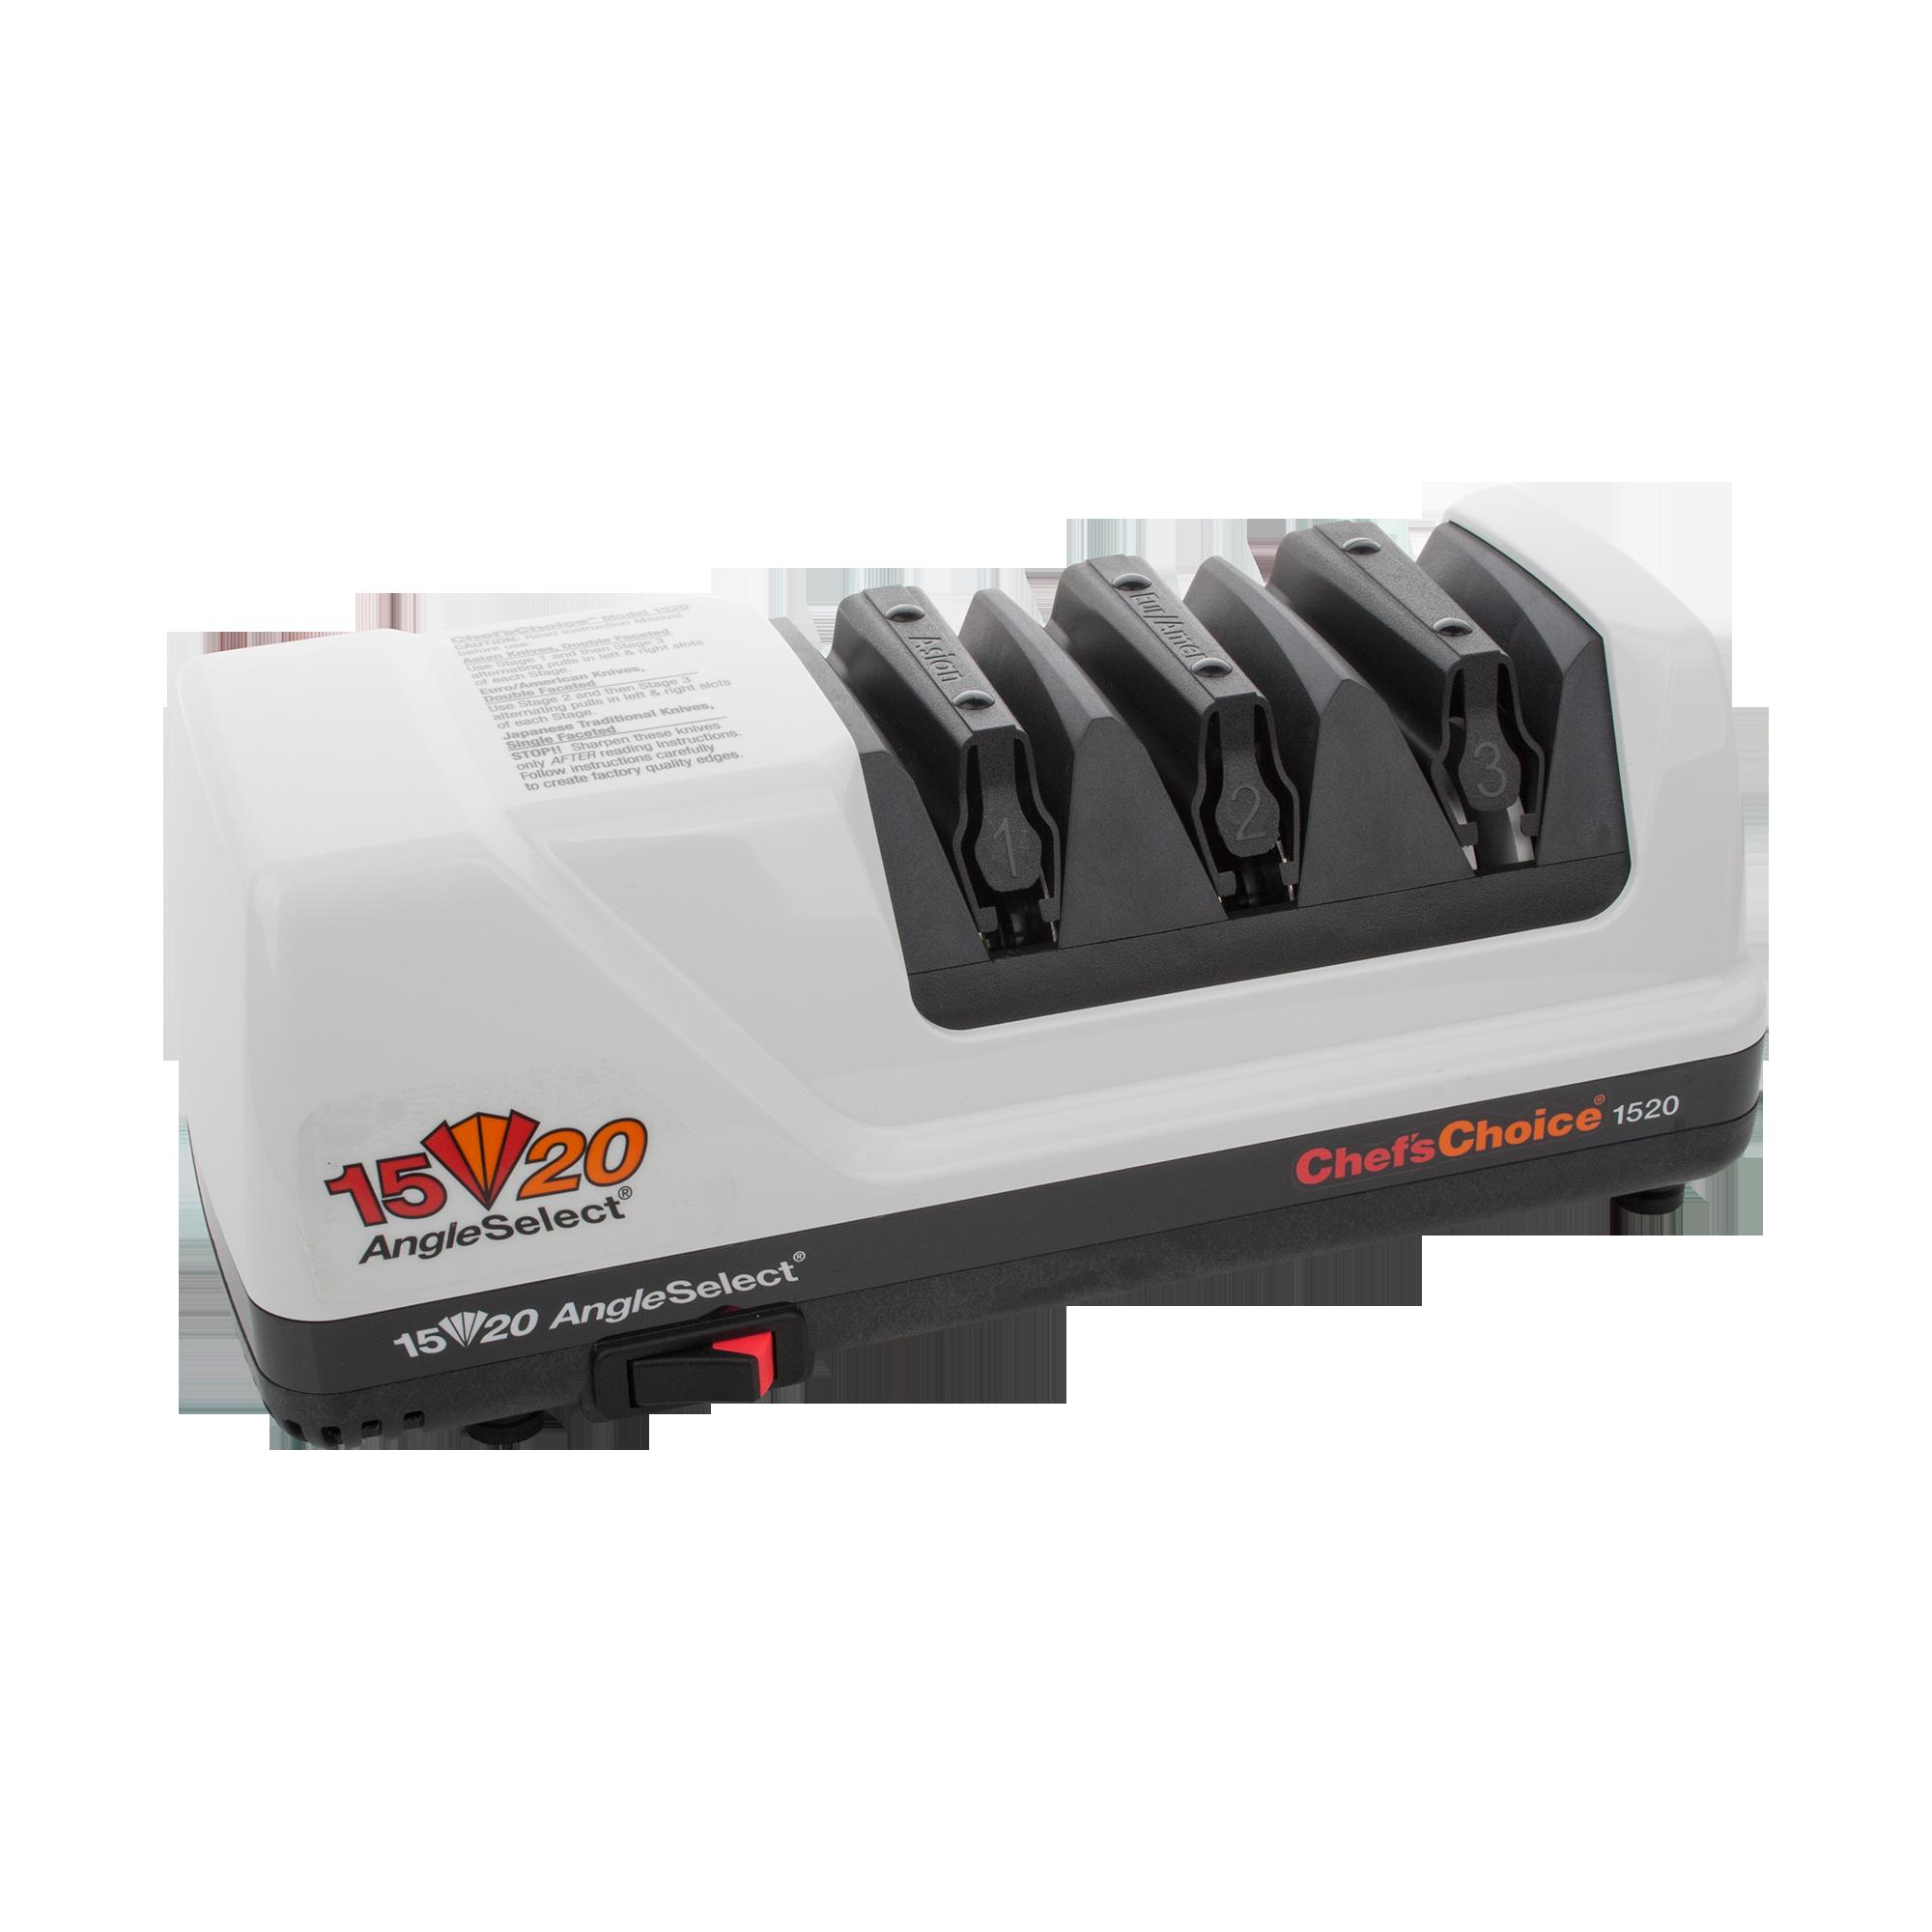 Электрический станок для заточки ножей Chef'sChoice CC1520W инструмент для заточки ножей kow 2015 1 360 apex edge 304 3 bb1